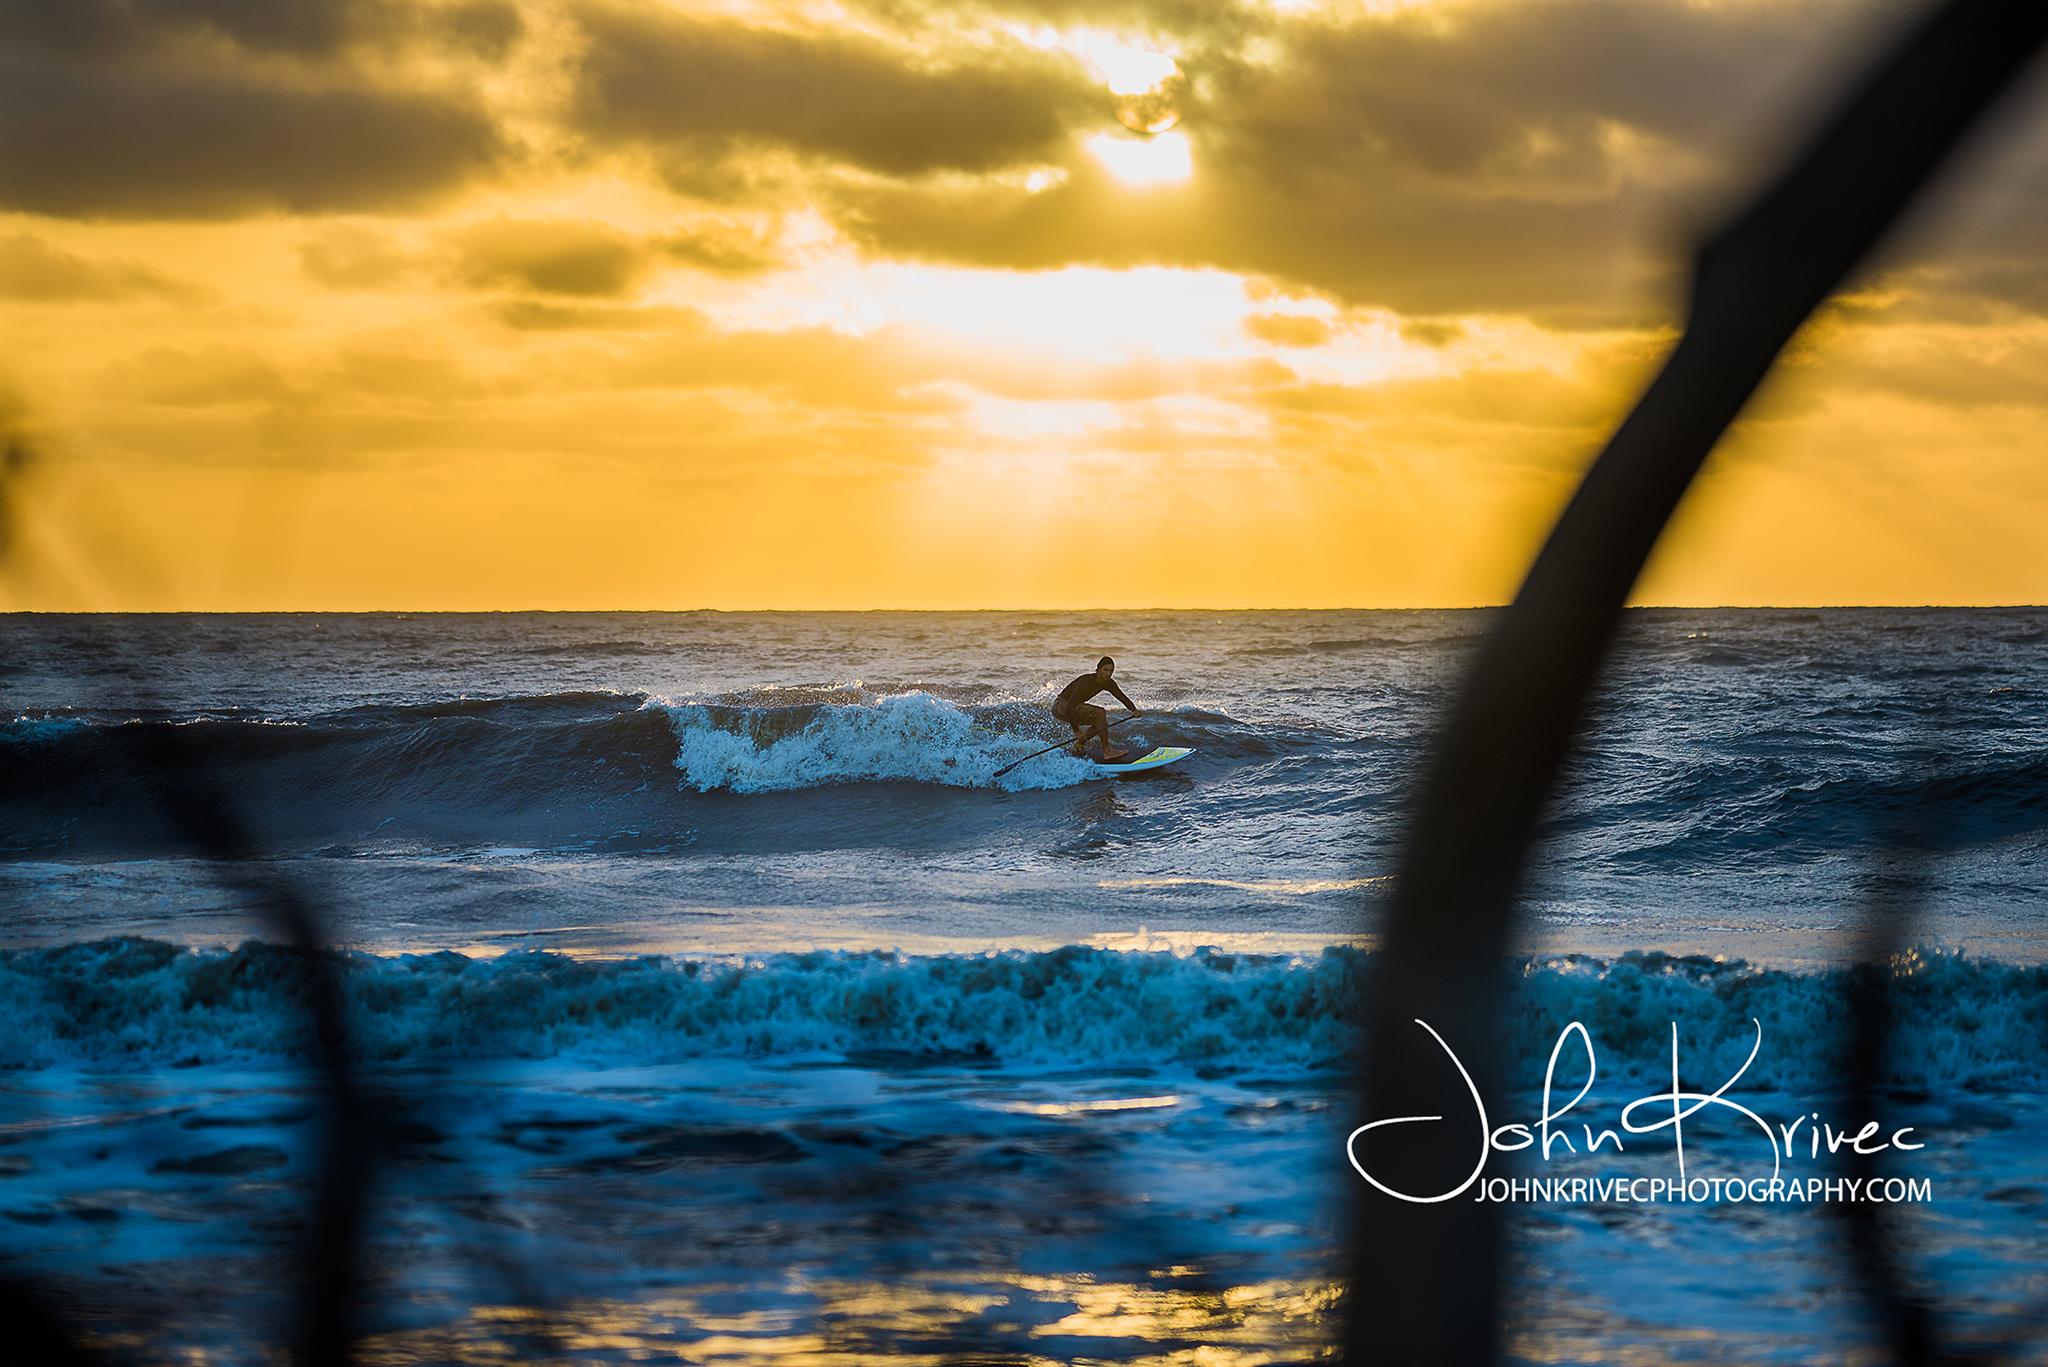 Saint Simons Paddle Surf